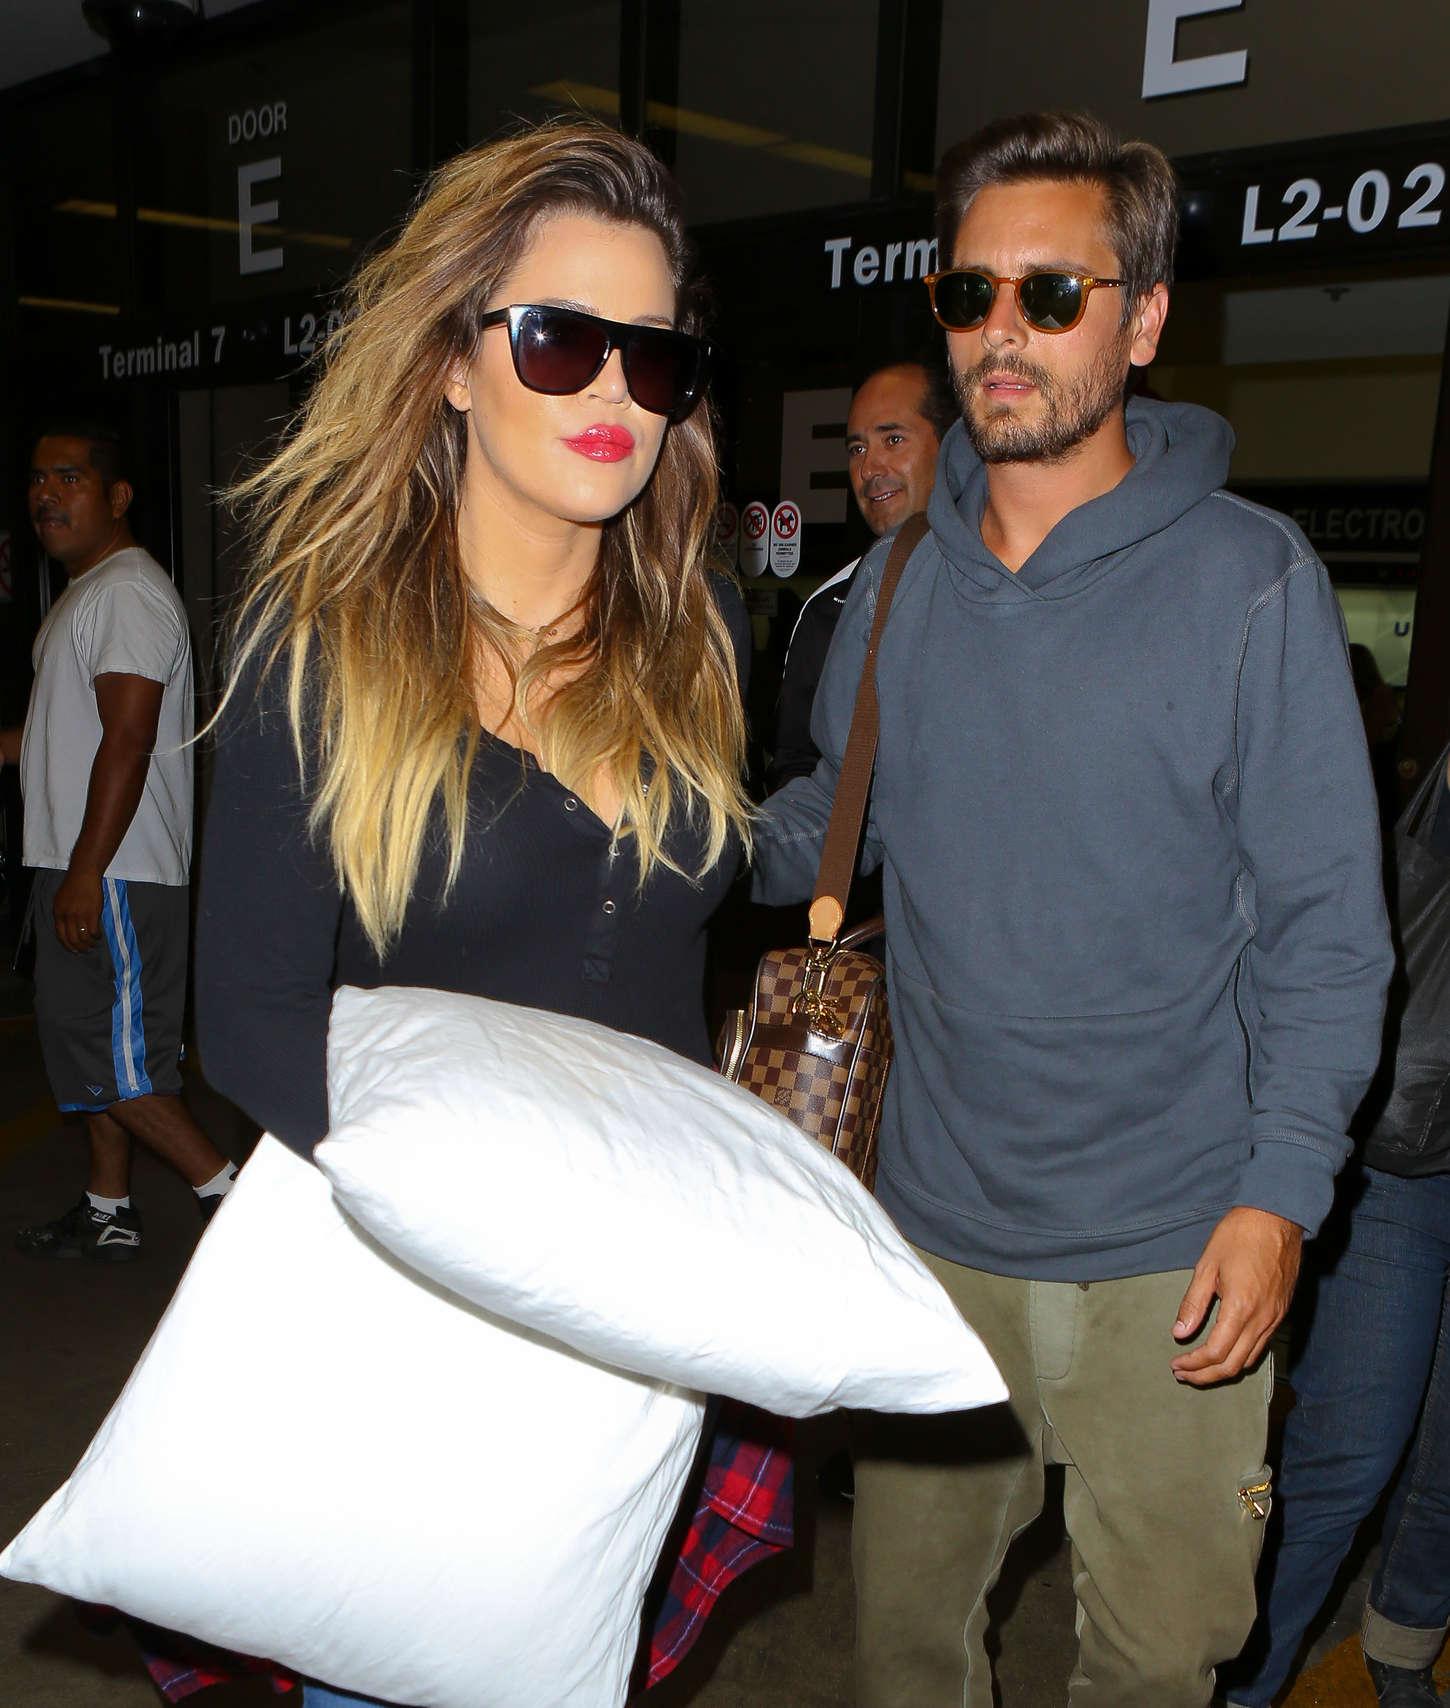 Khloe Kardashian 2014 : Khloe Kardashian with Scott Disick at LAX airport -12